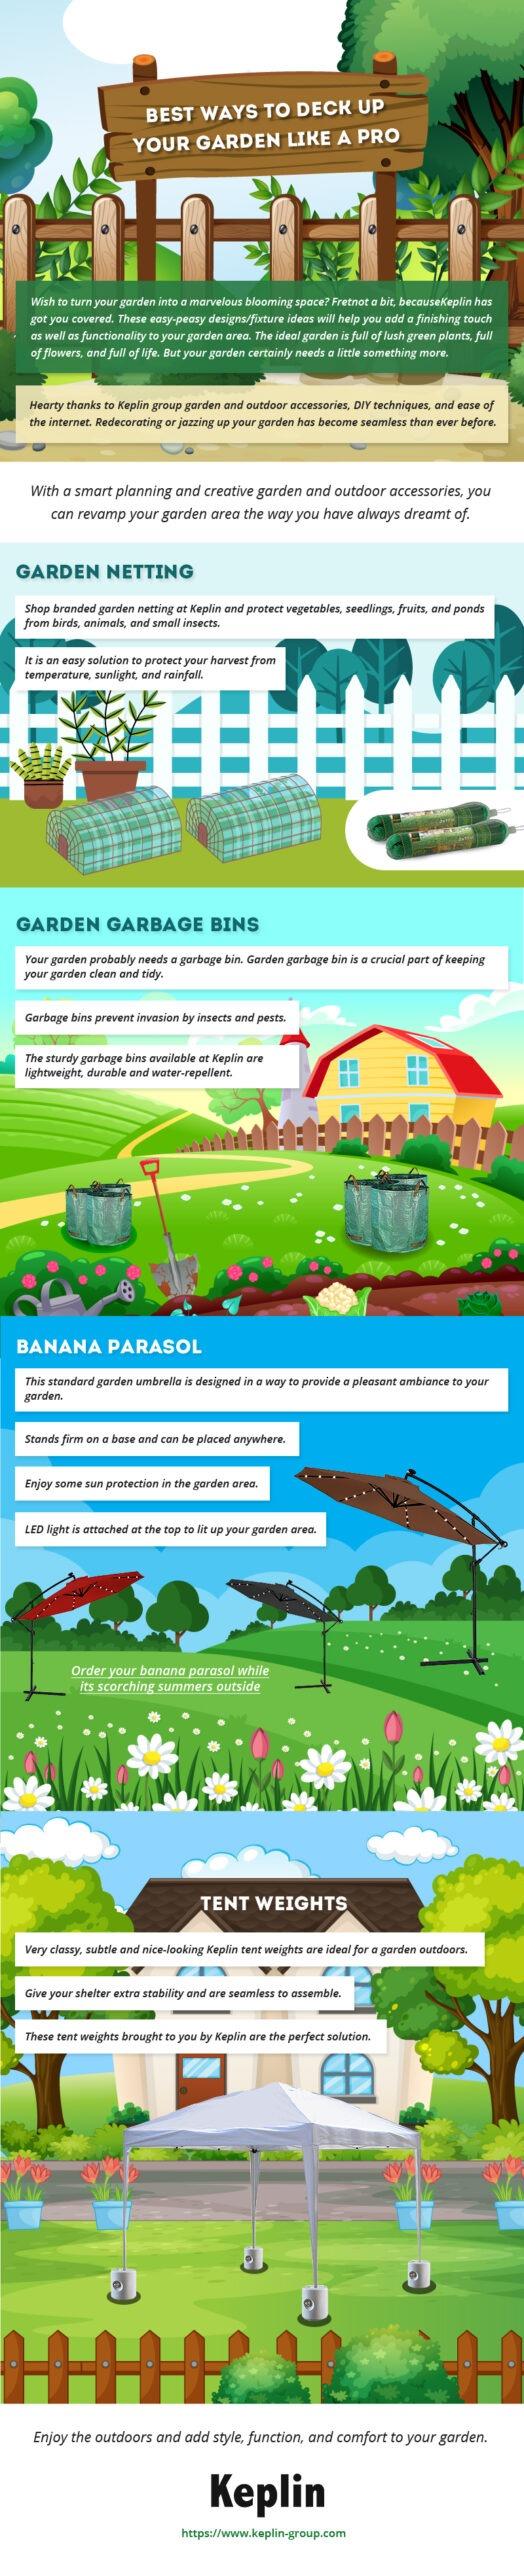 Keplin Infographic 01